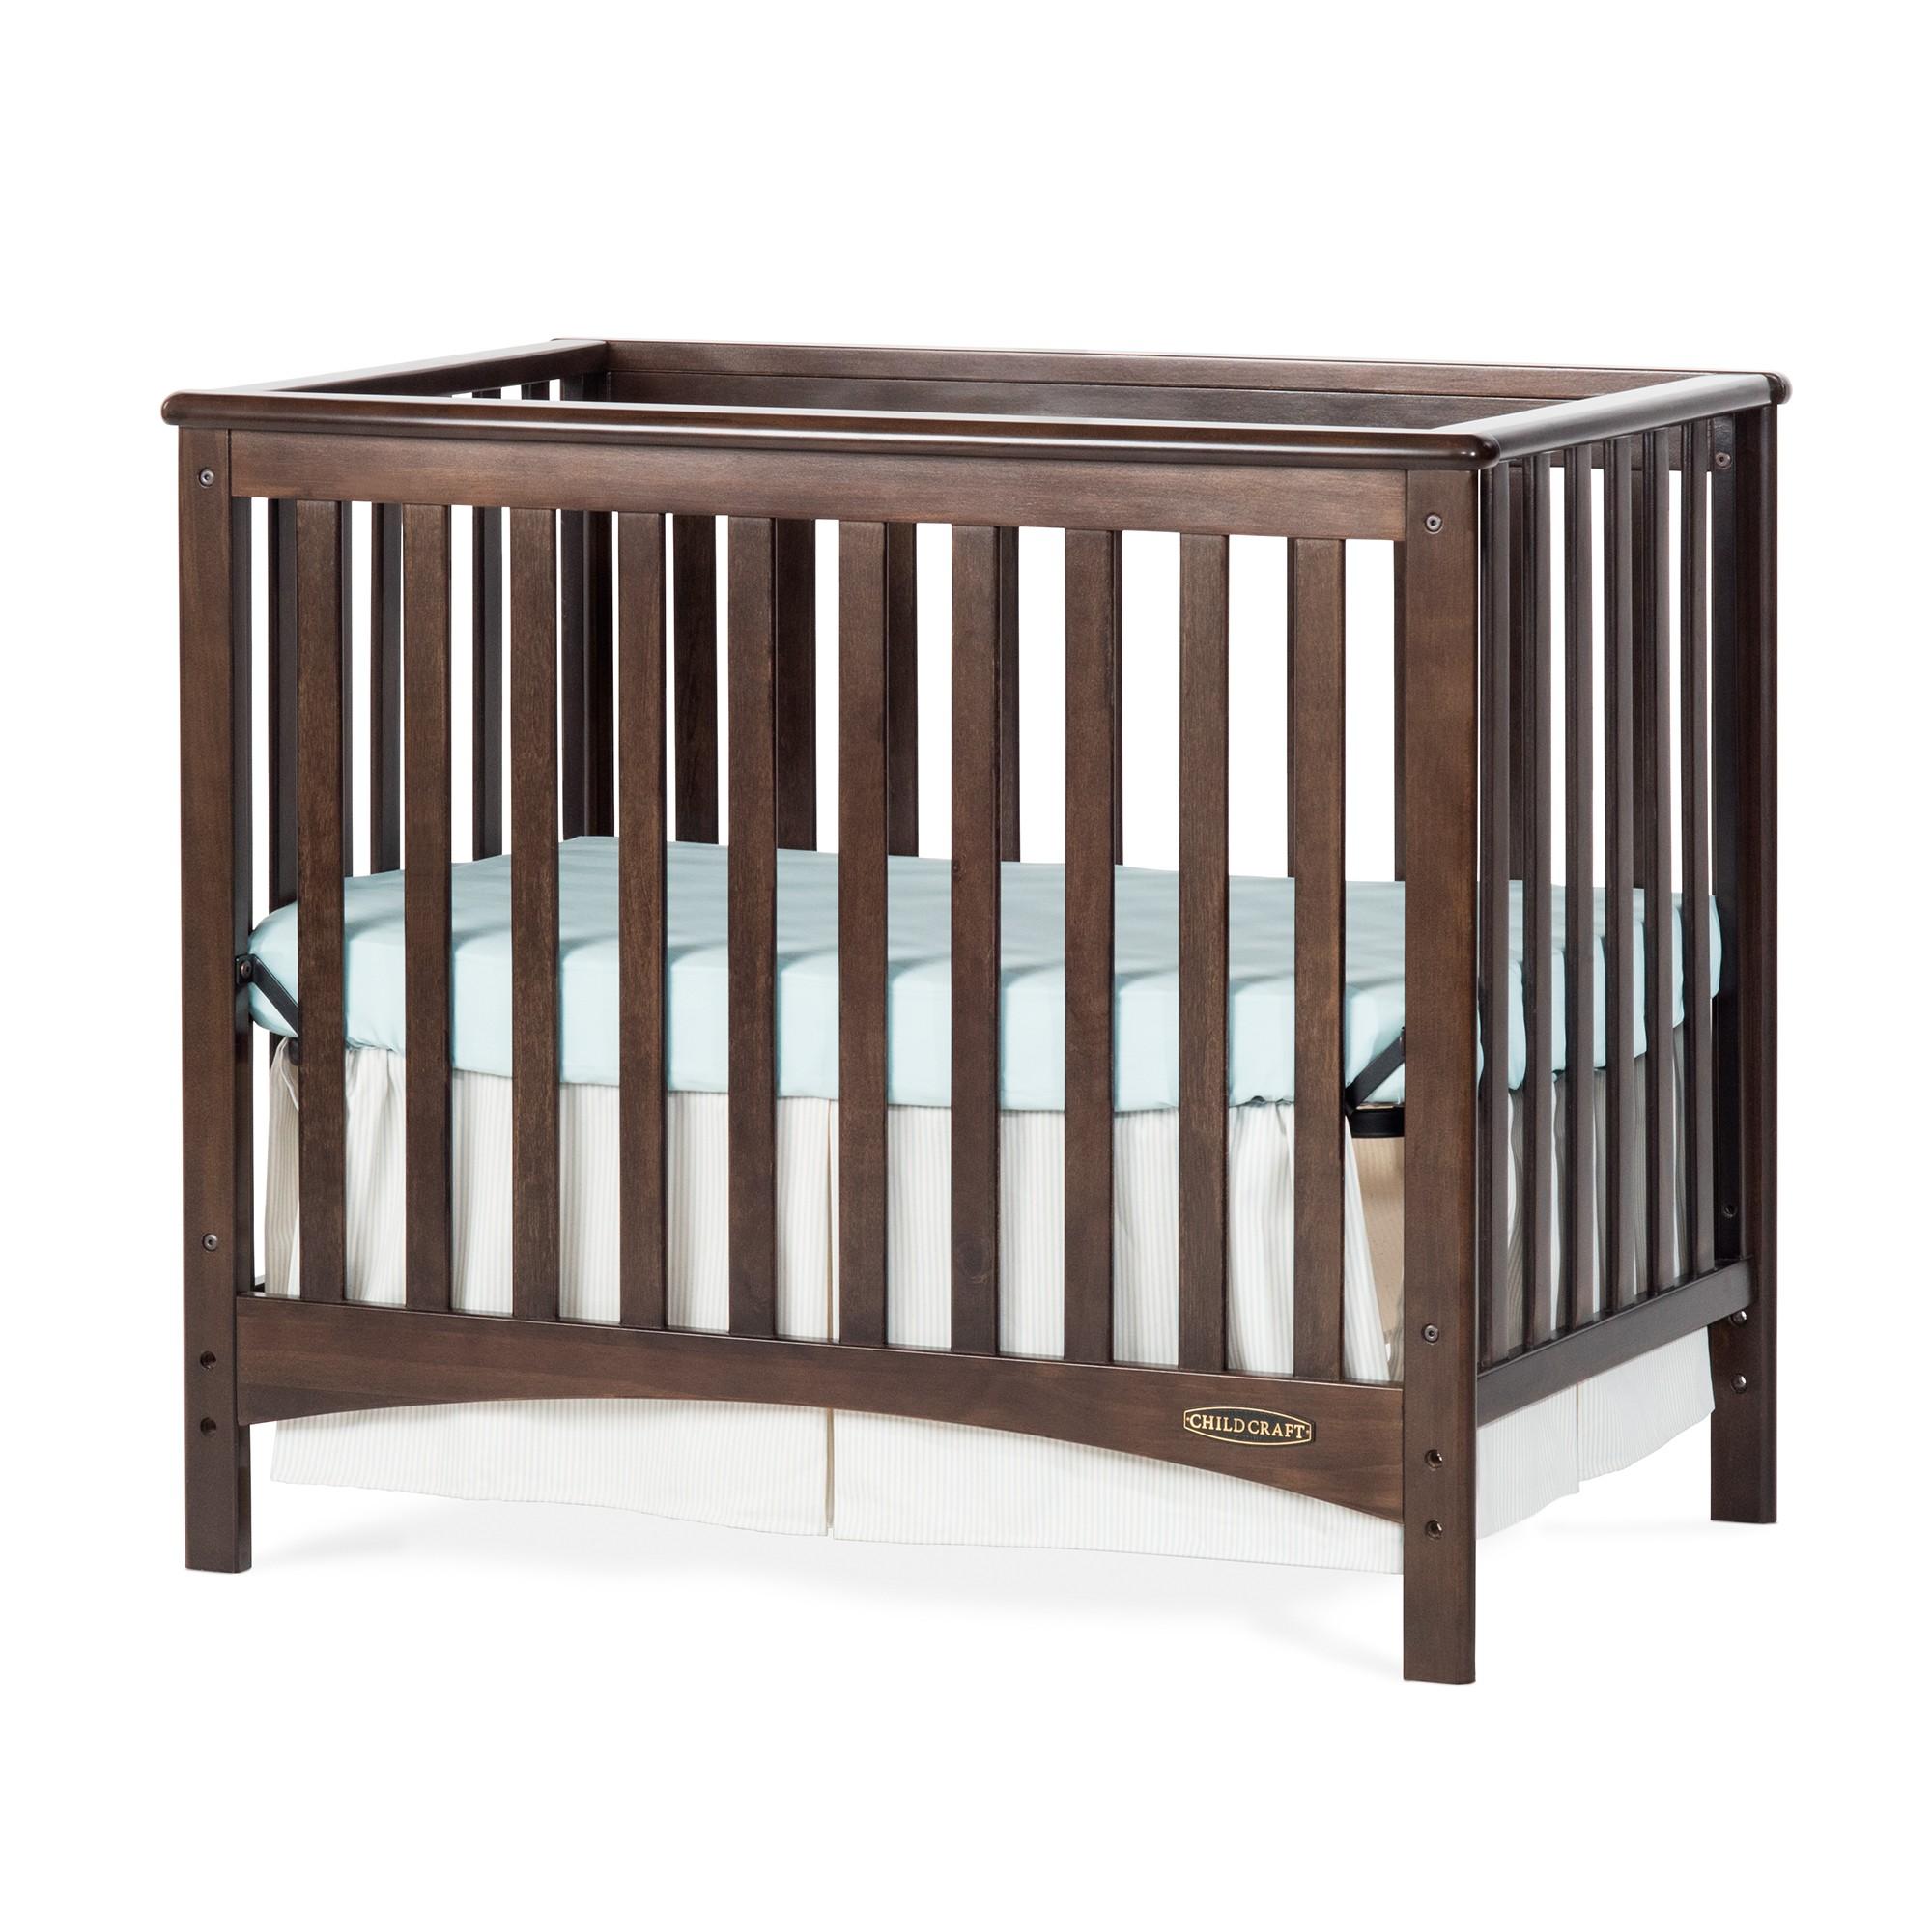 Child craft camden crib - Child Craft Camden Crib 44